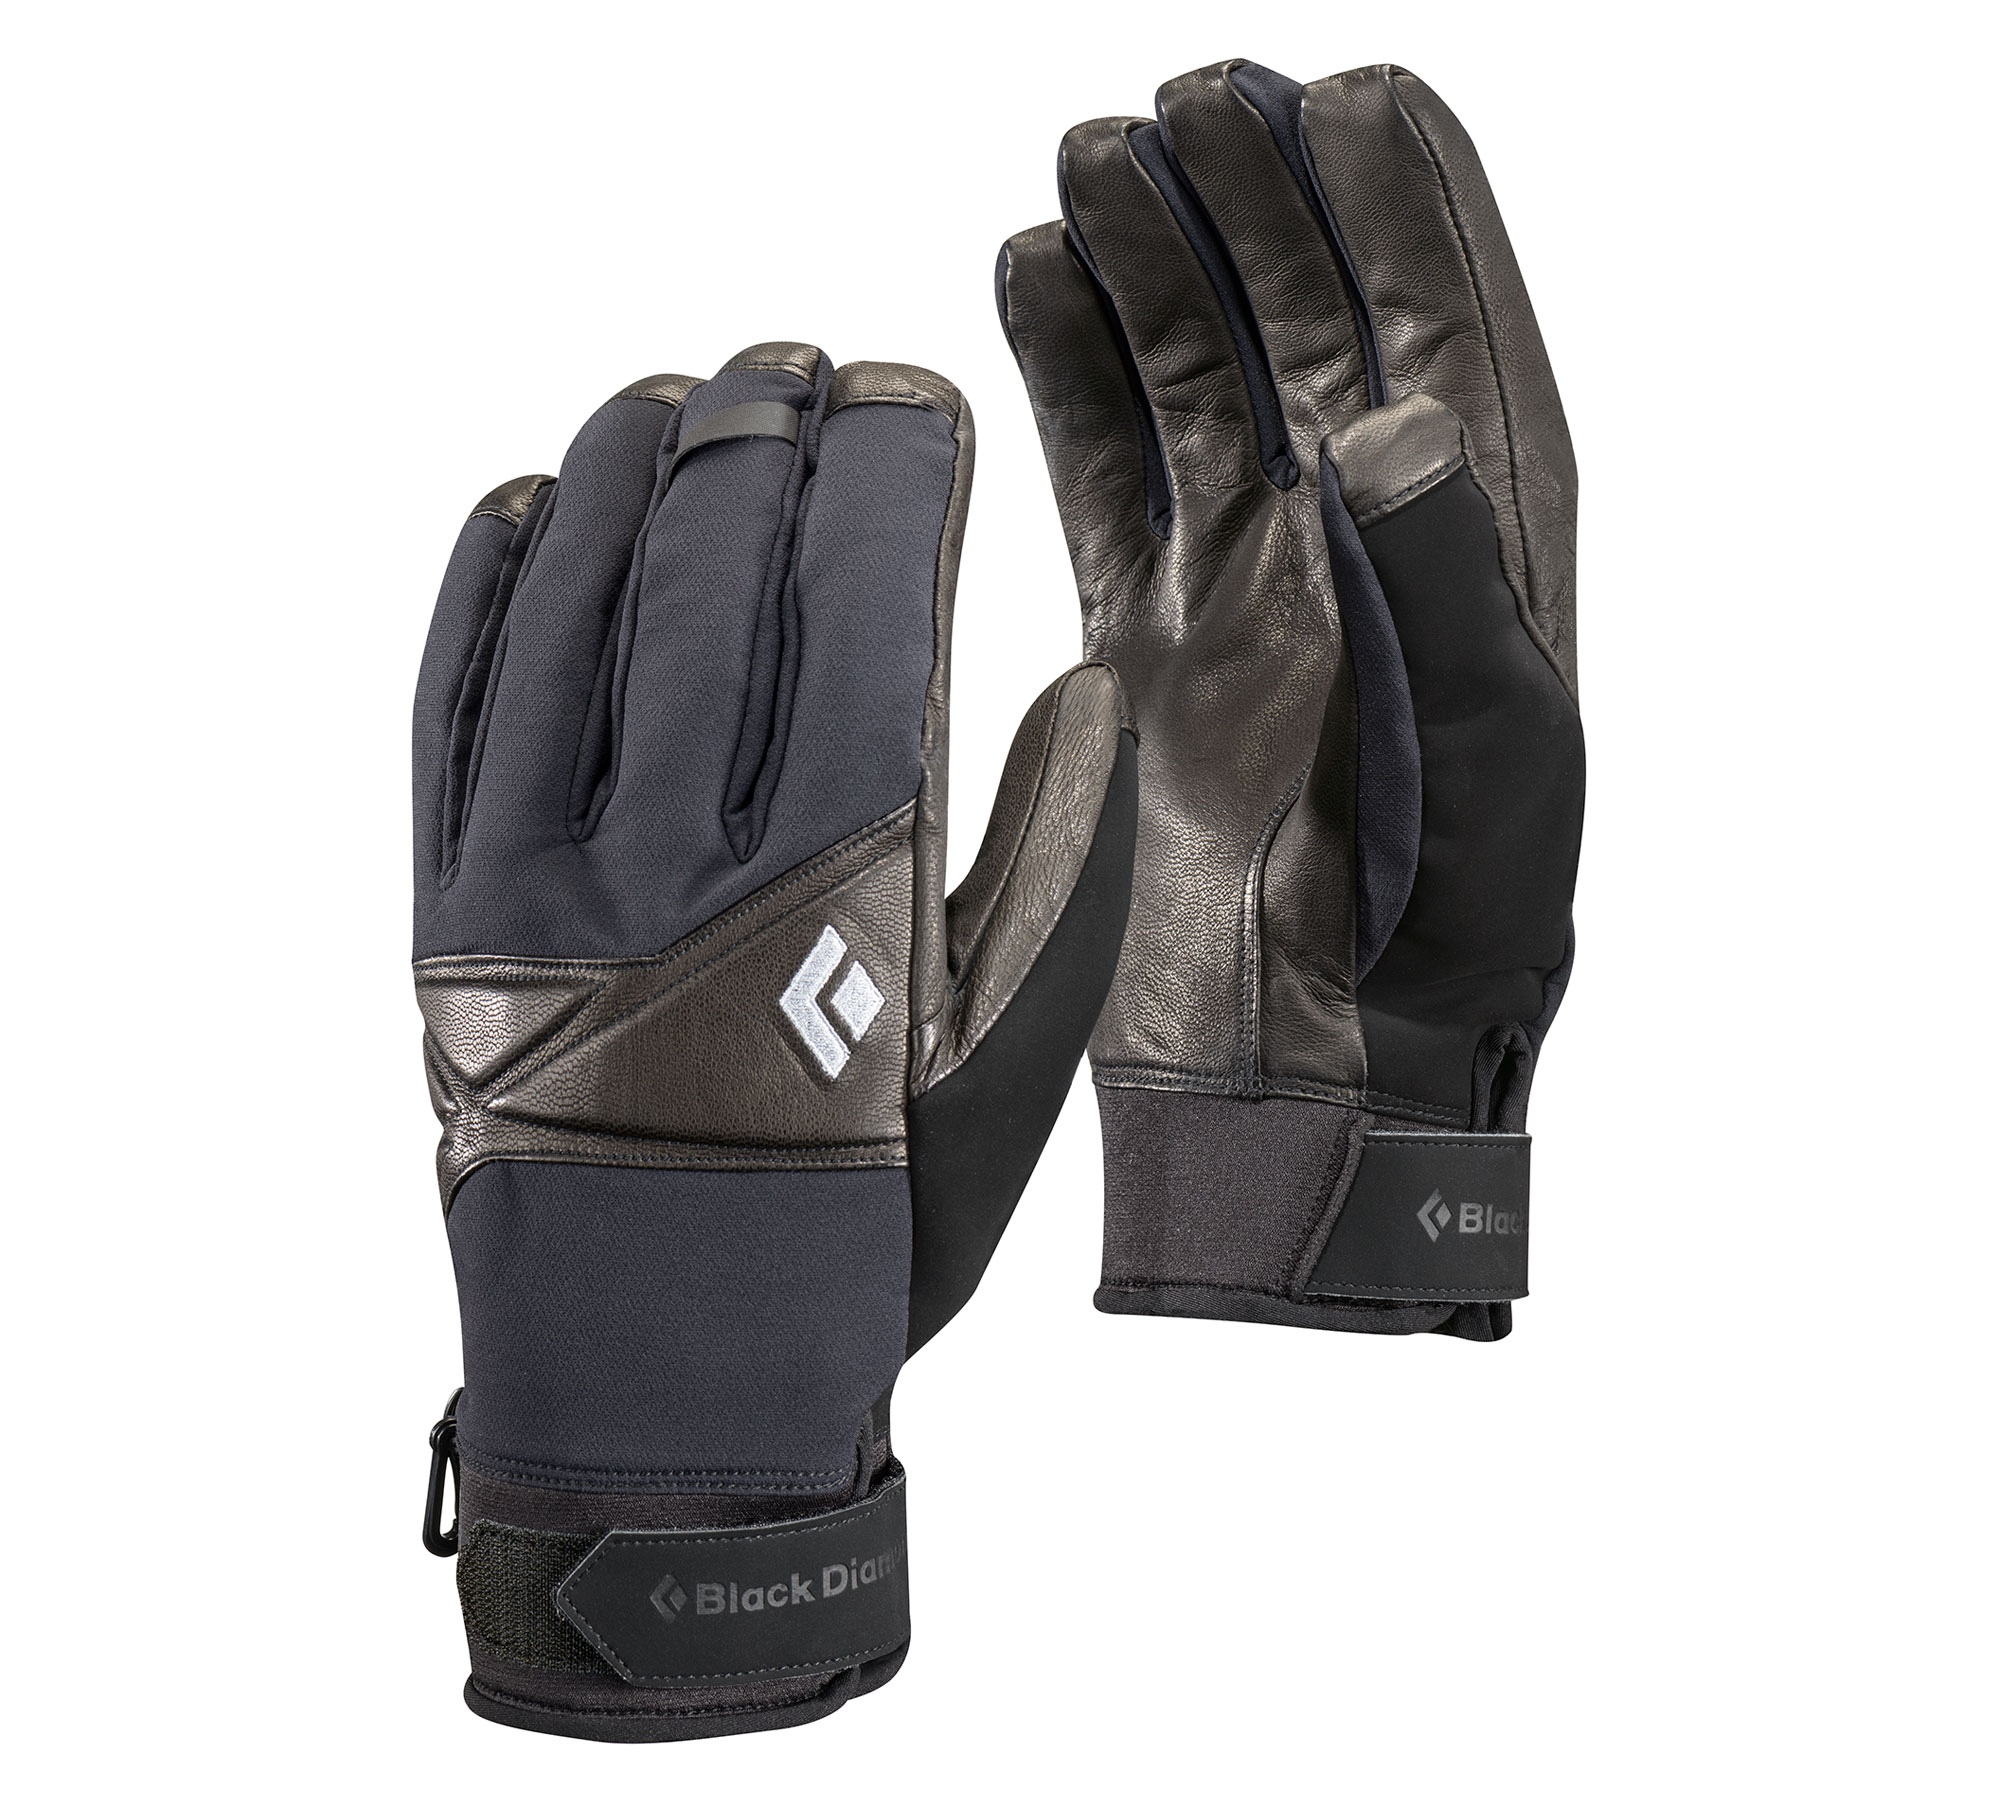 Black Diamond Terminator Gloves - Gants escalade